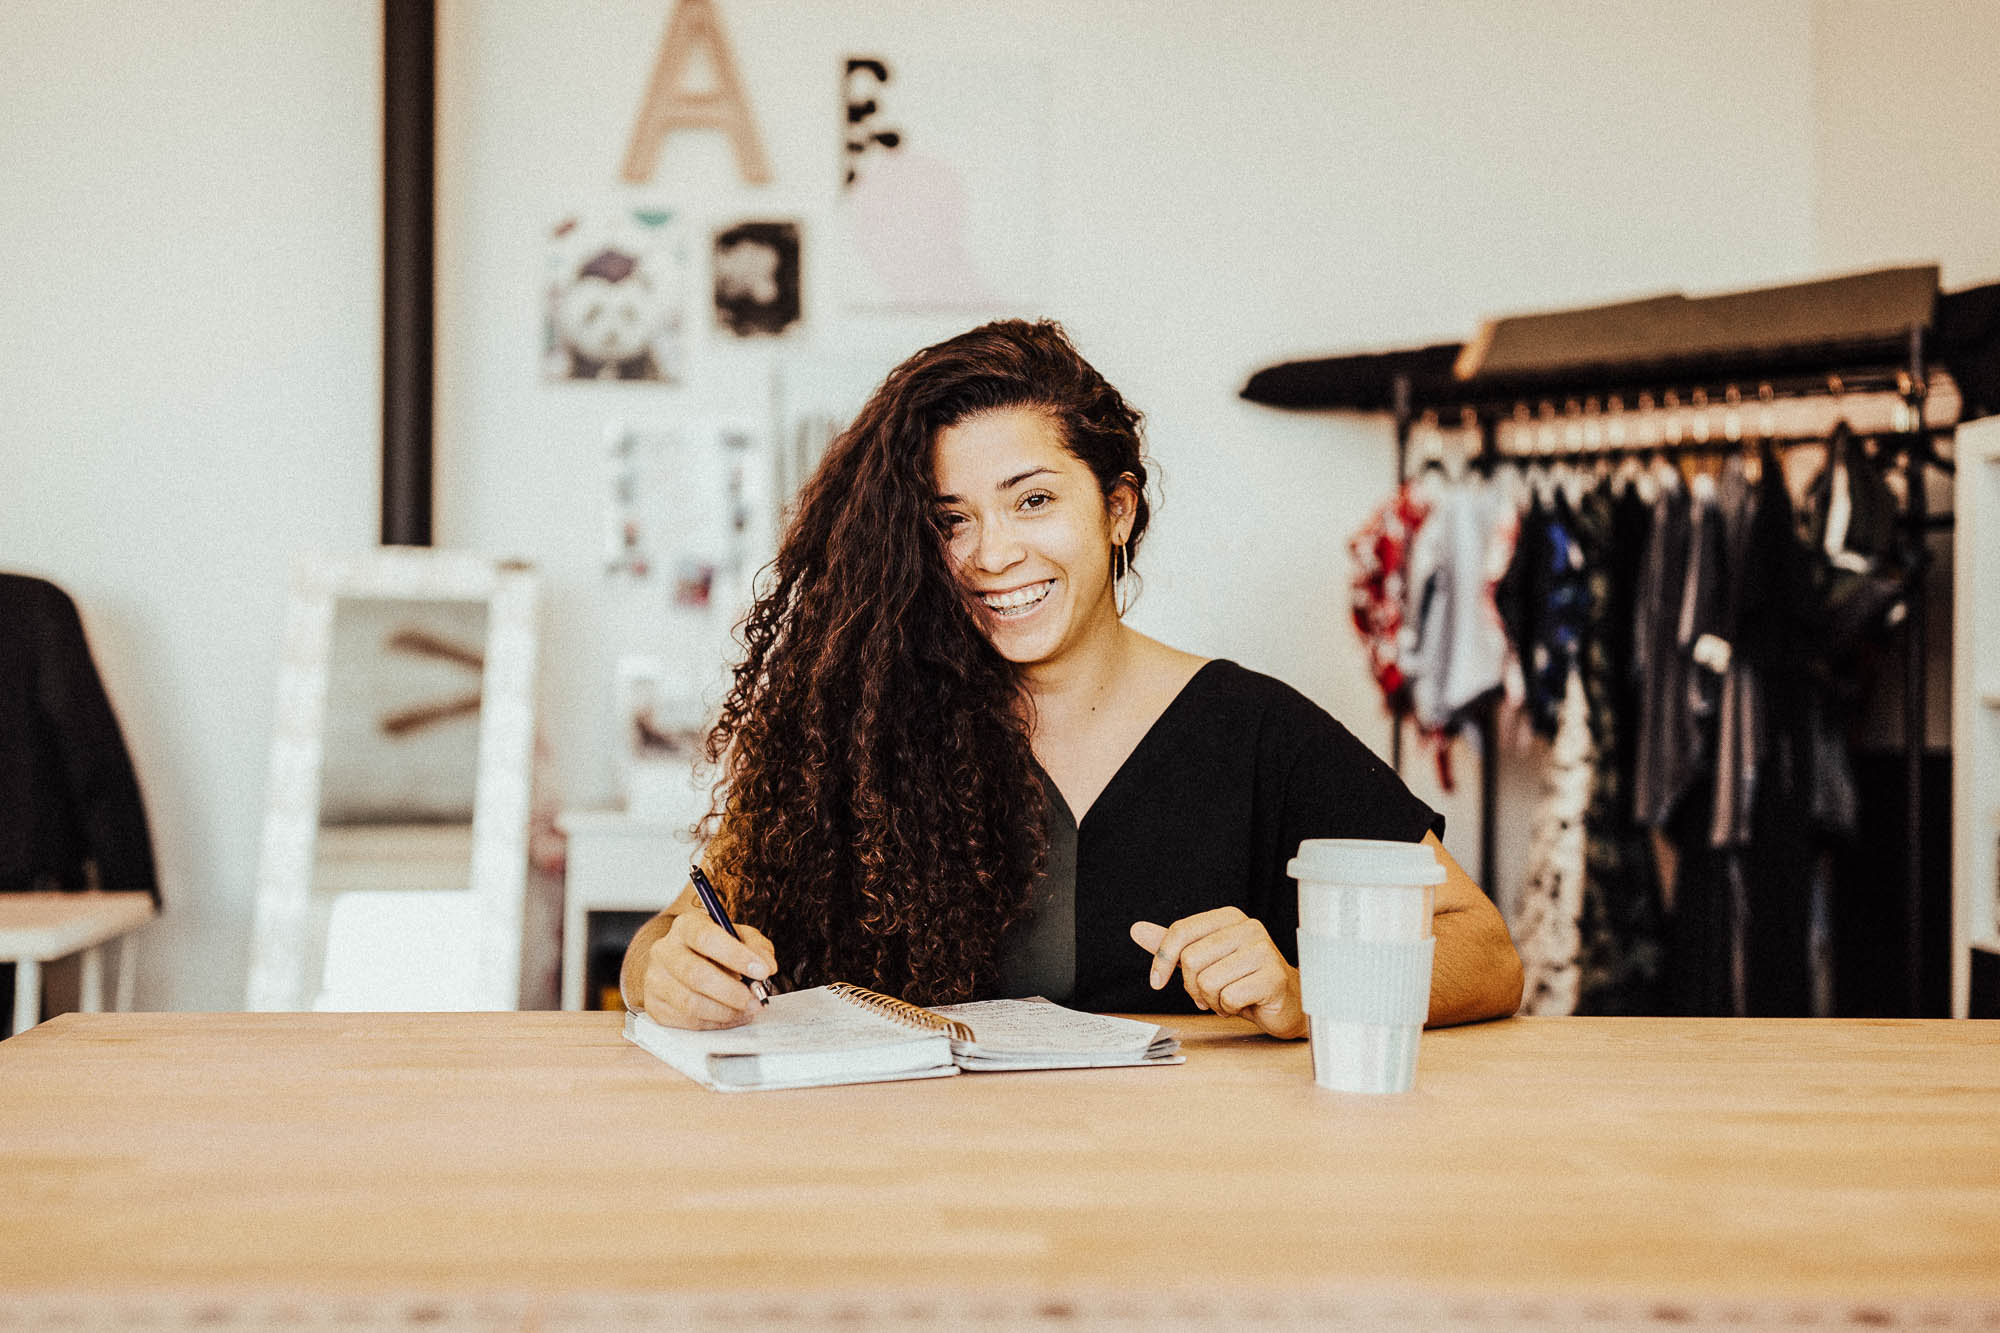 Amanda in her workspace